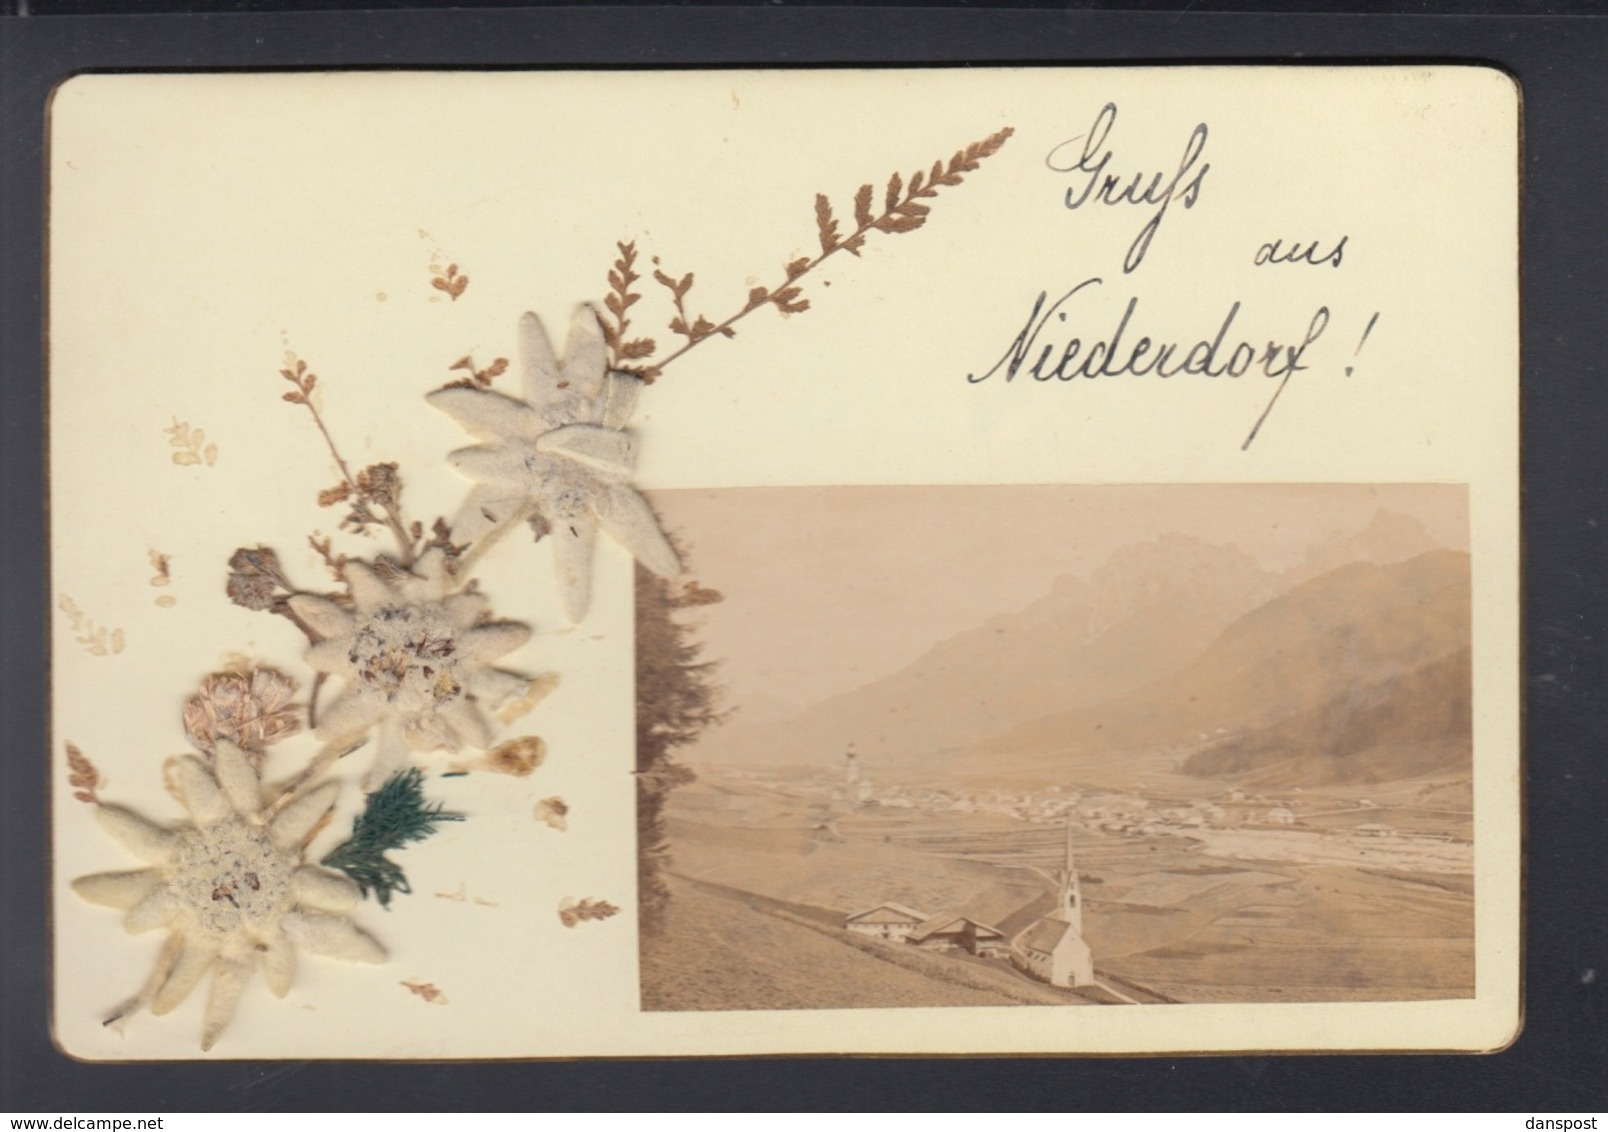 Cartolina Niederdorf 1895 - Italia